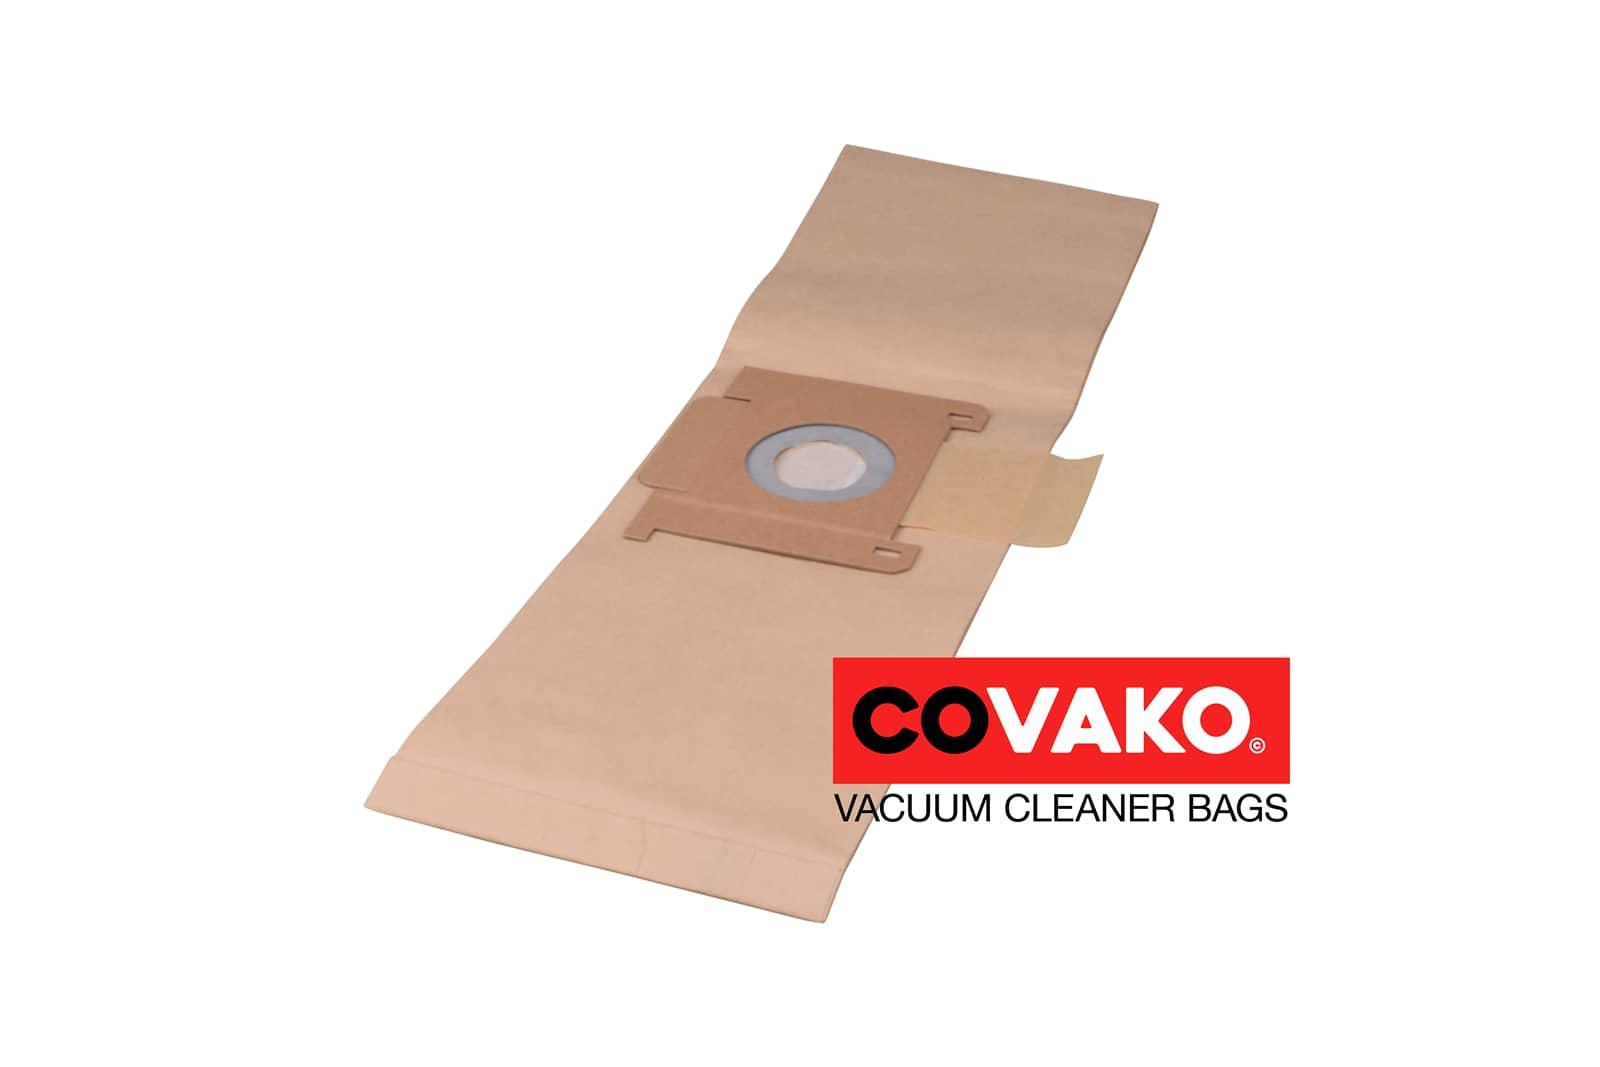 Fast C 5 / Paper - Fast vacuum cleaner bags